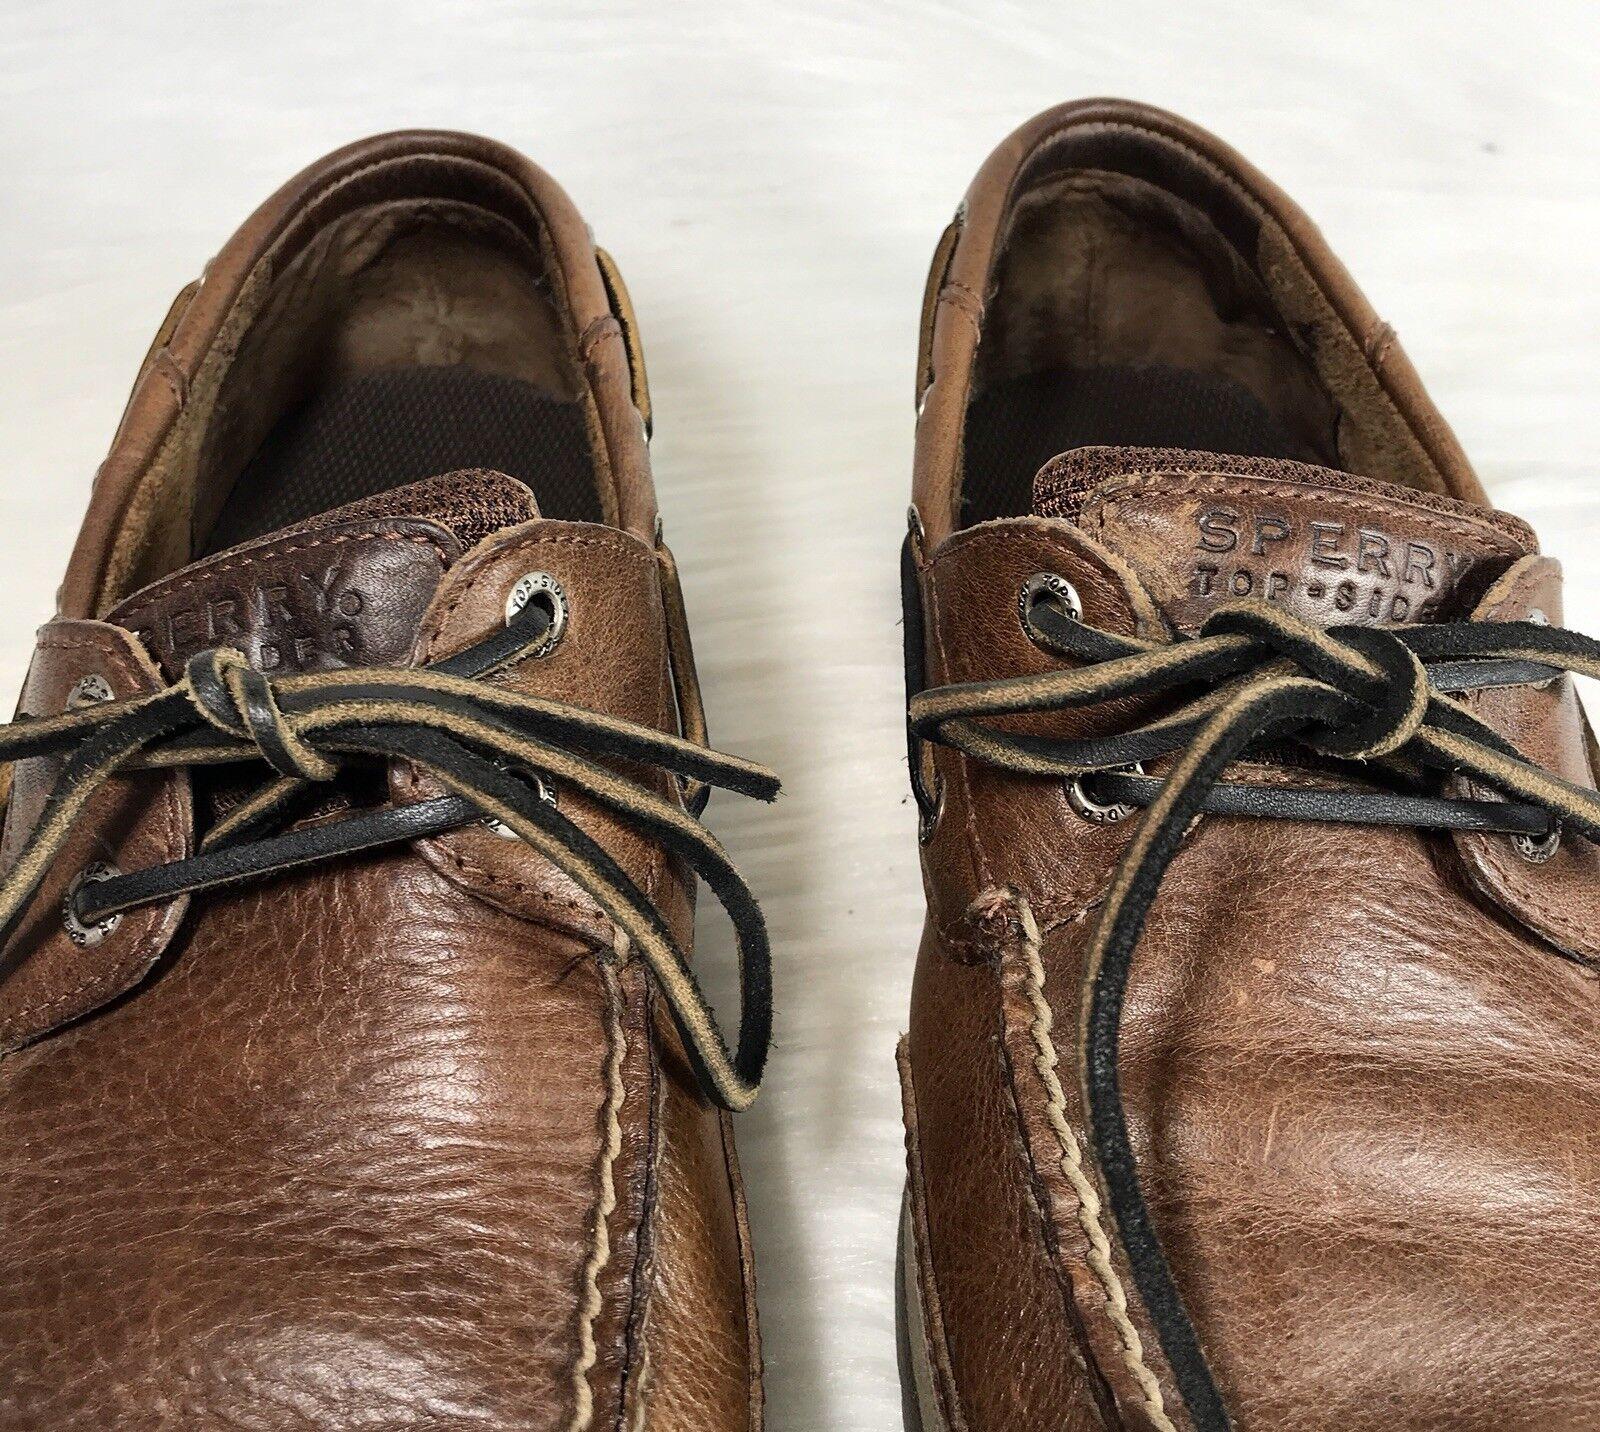 f7959cc8841 ... Sperry Top-Sider Para hombres Zapatos Náuticos Náuticos Náuticos Marrón  Cuero M 0dec34 ...